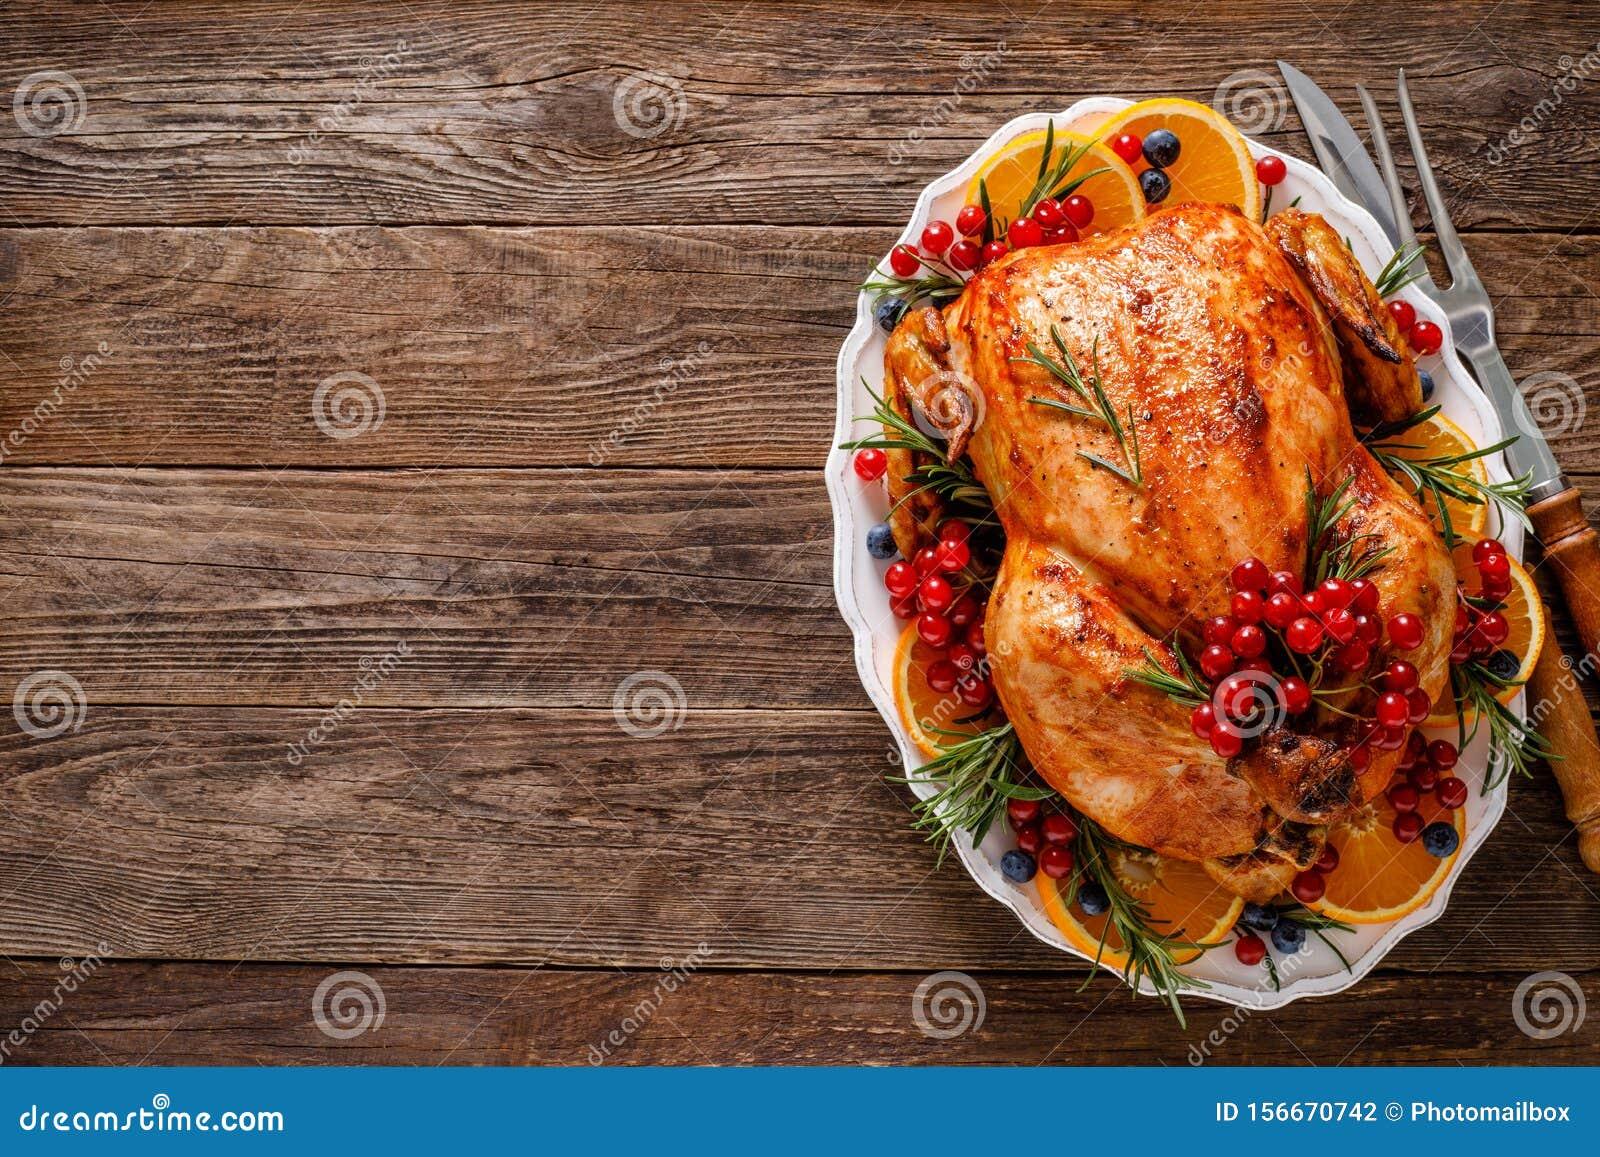 Christmas Turkey Traditional Festive Food For Christmas Or